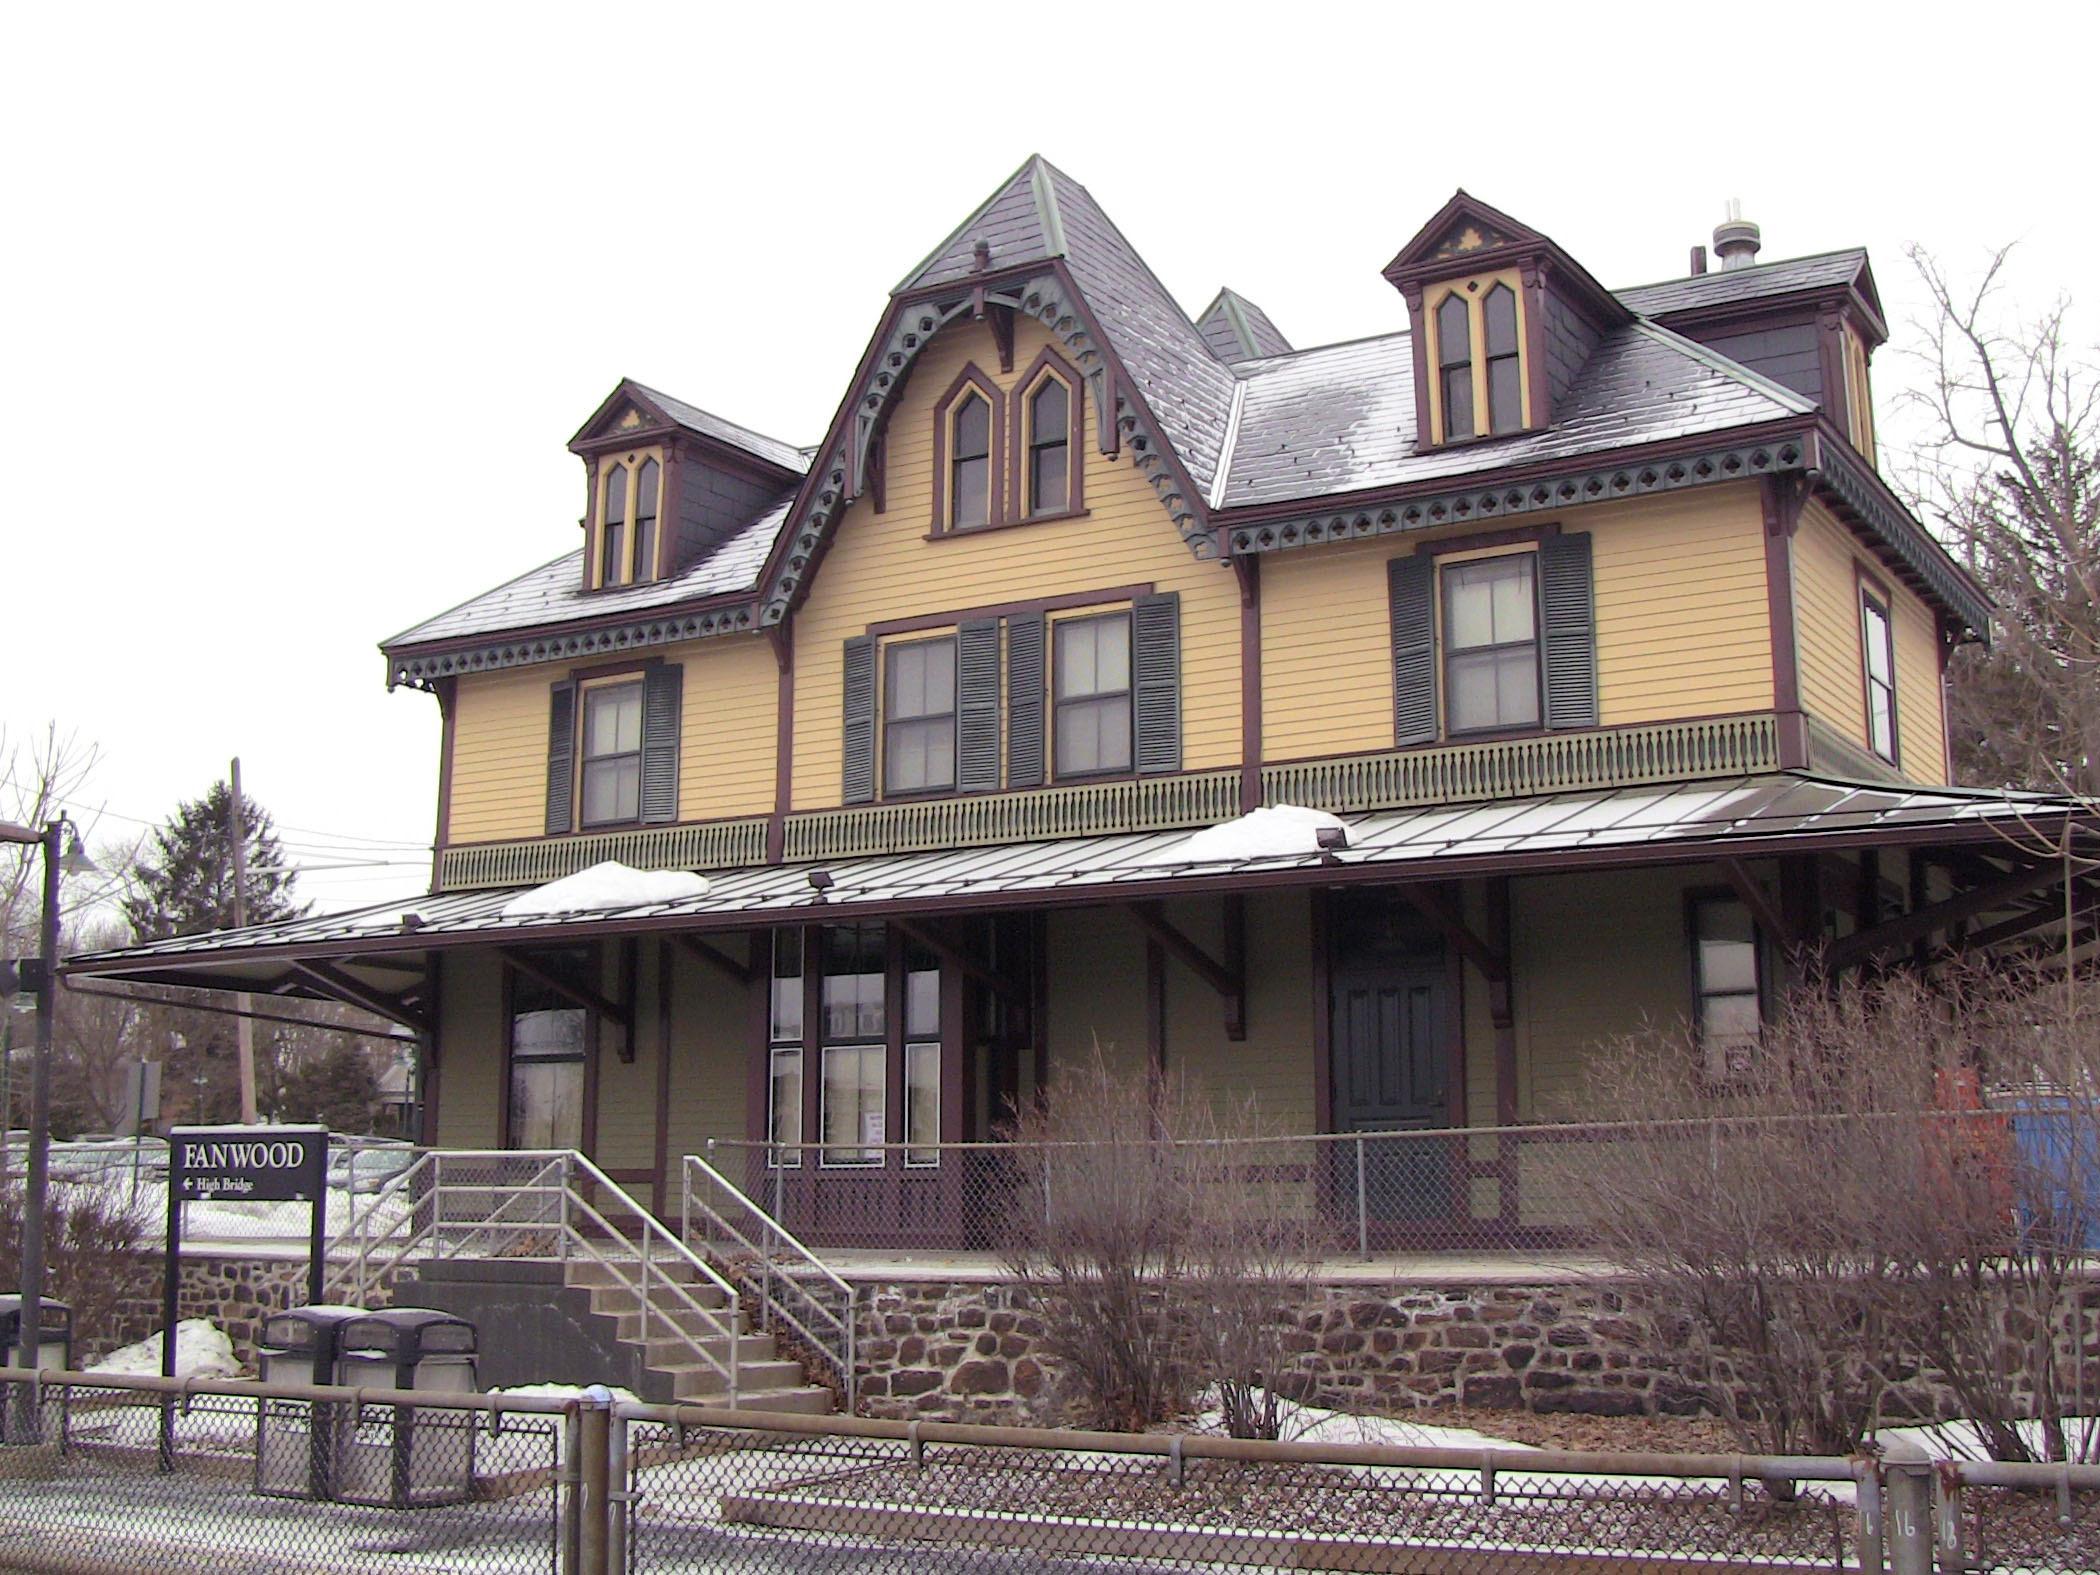 2c51acdfd44b6303e125_Fanwood_Train_Station_House.jpg